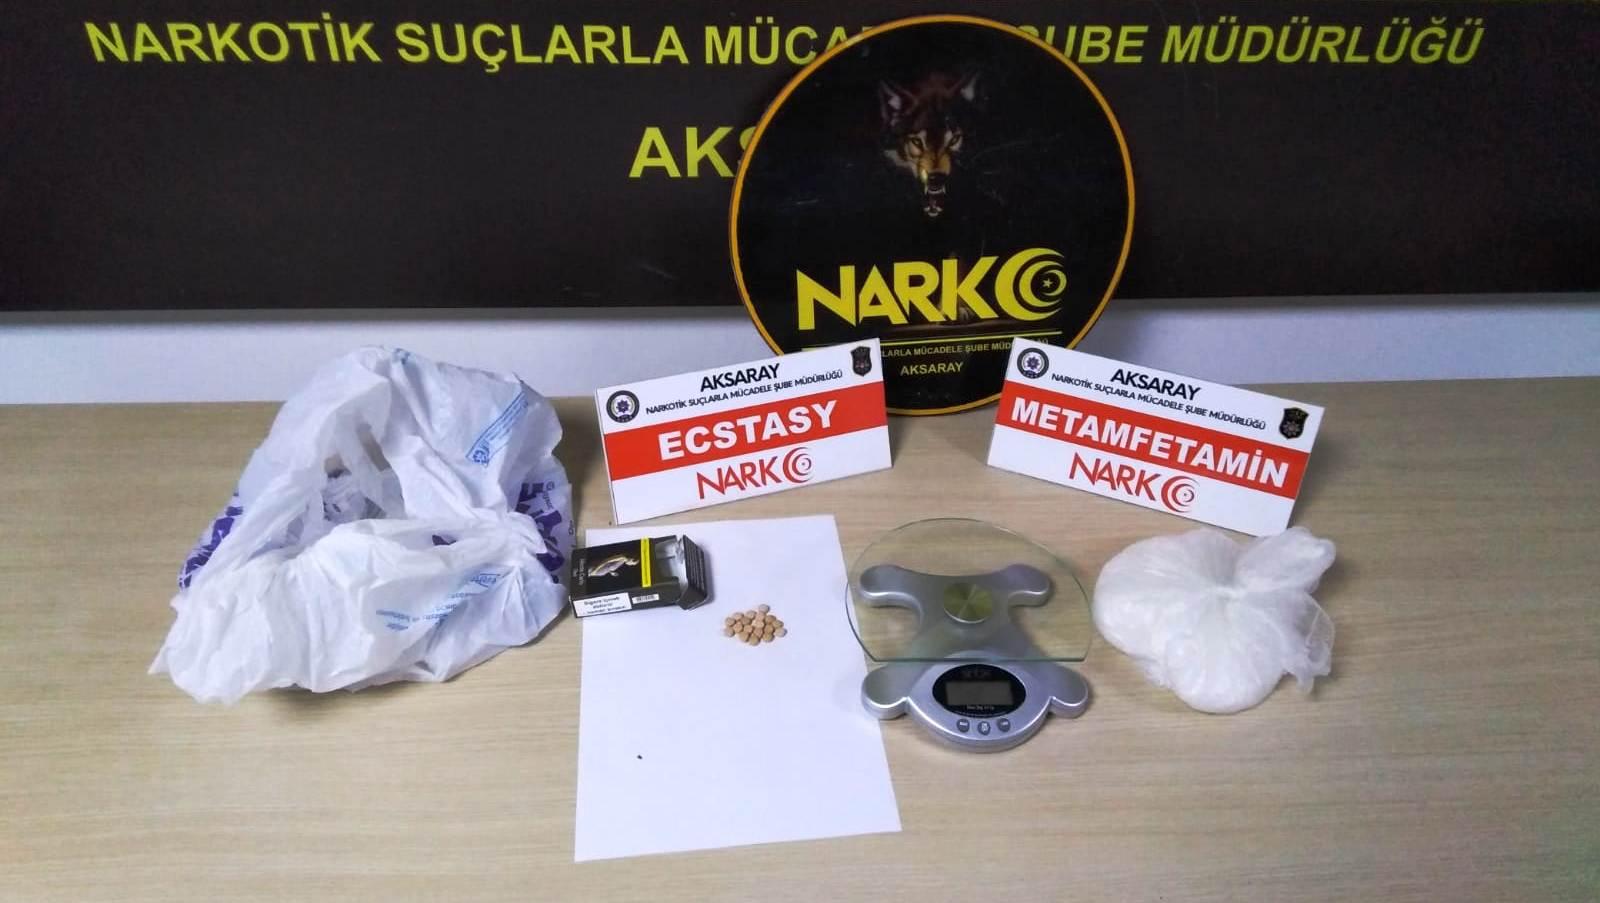 Aksaray polisinden torbacılara operasyon 3 tutuklama